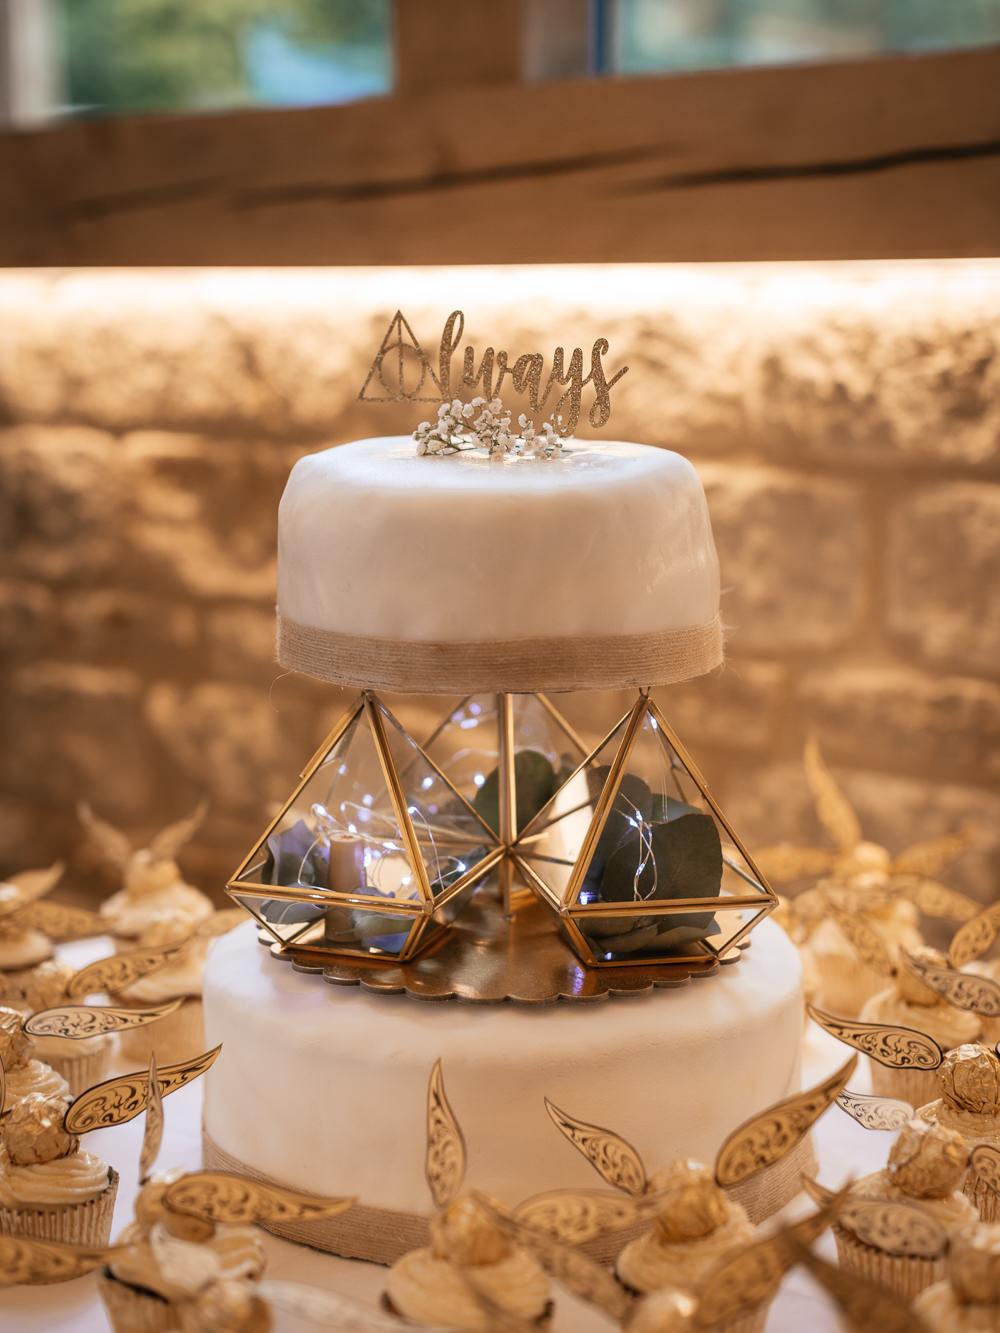 Harry Potter Cake Geometric Always Golden Snitch Fairy Light Mickleton Hills Farm Wedding Jules Barron Photography